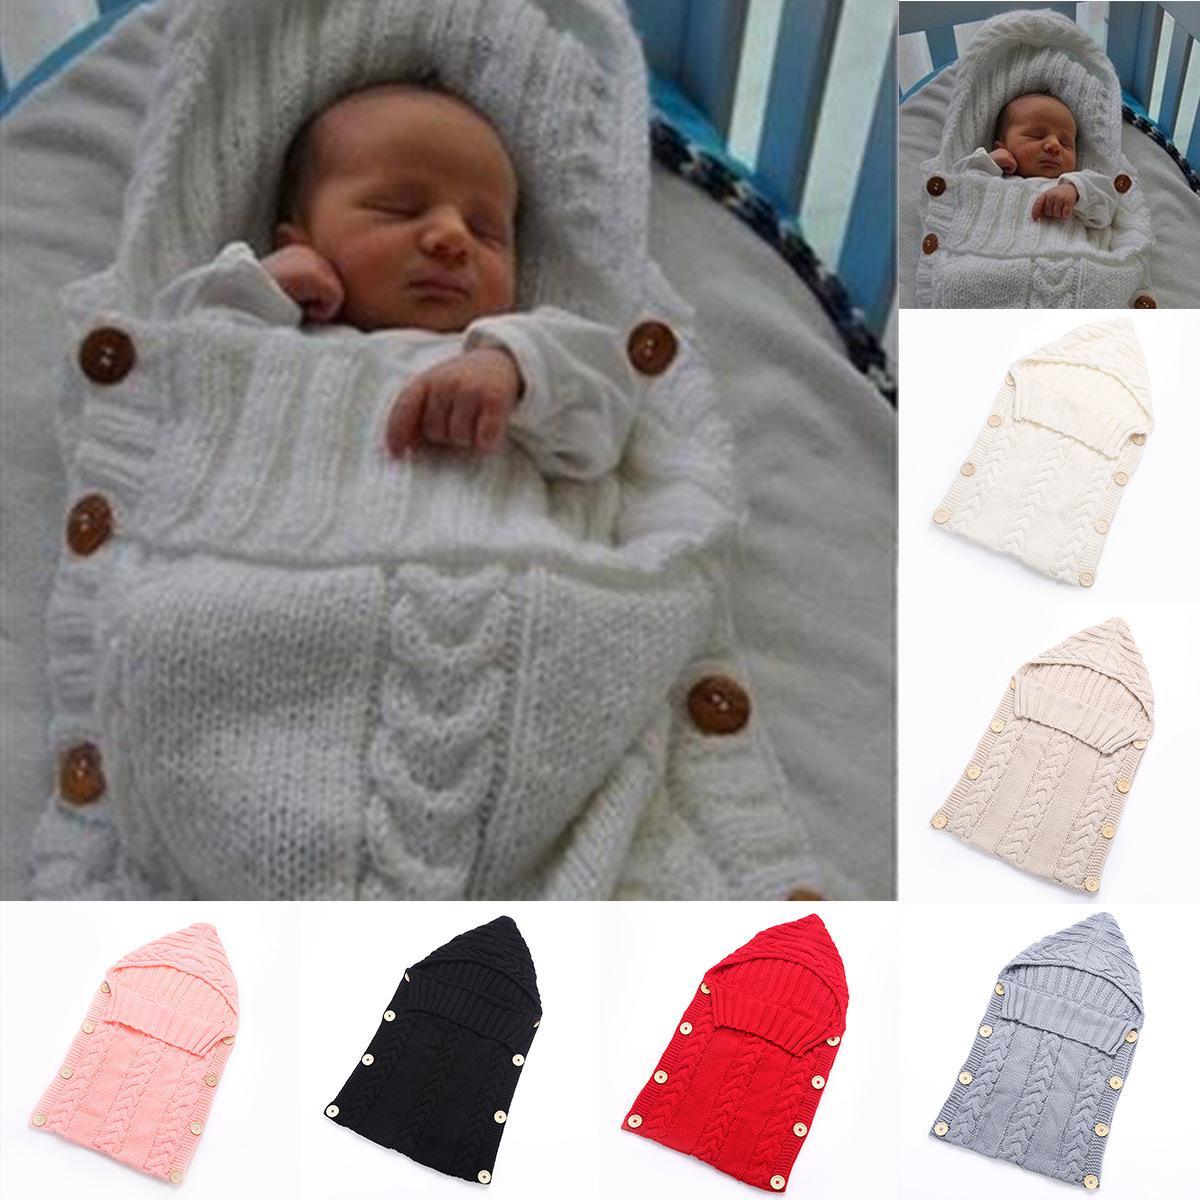 Baby Knitted Sleeping Bag Winter Newborn Sleep Blanket Infants